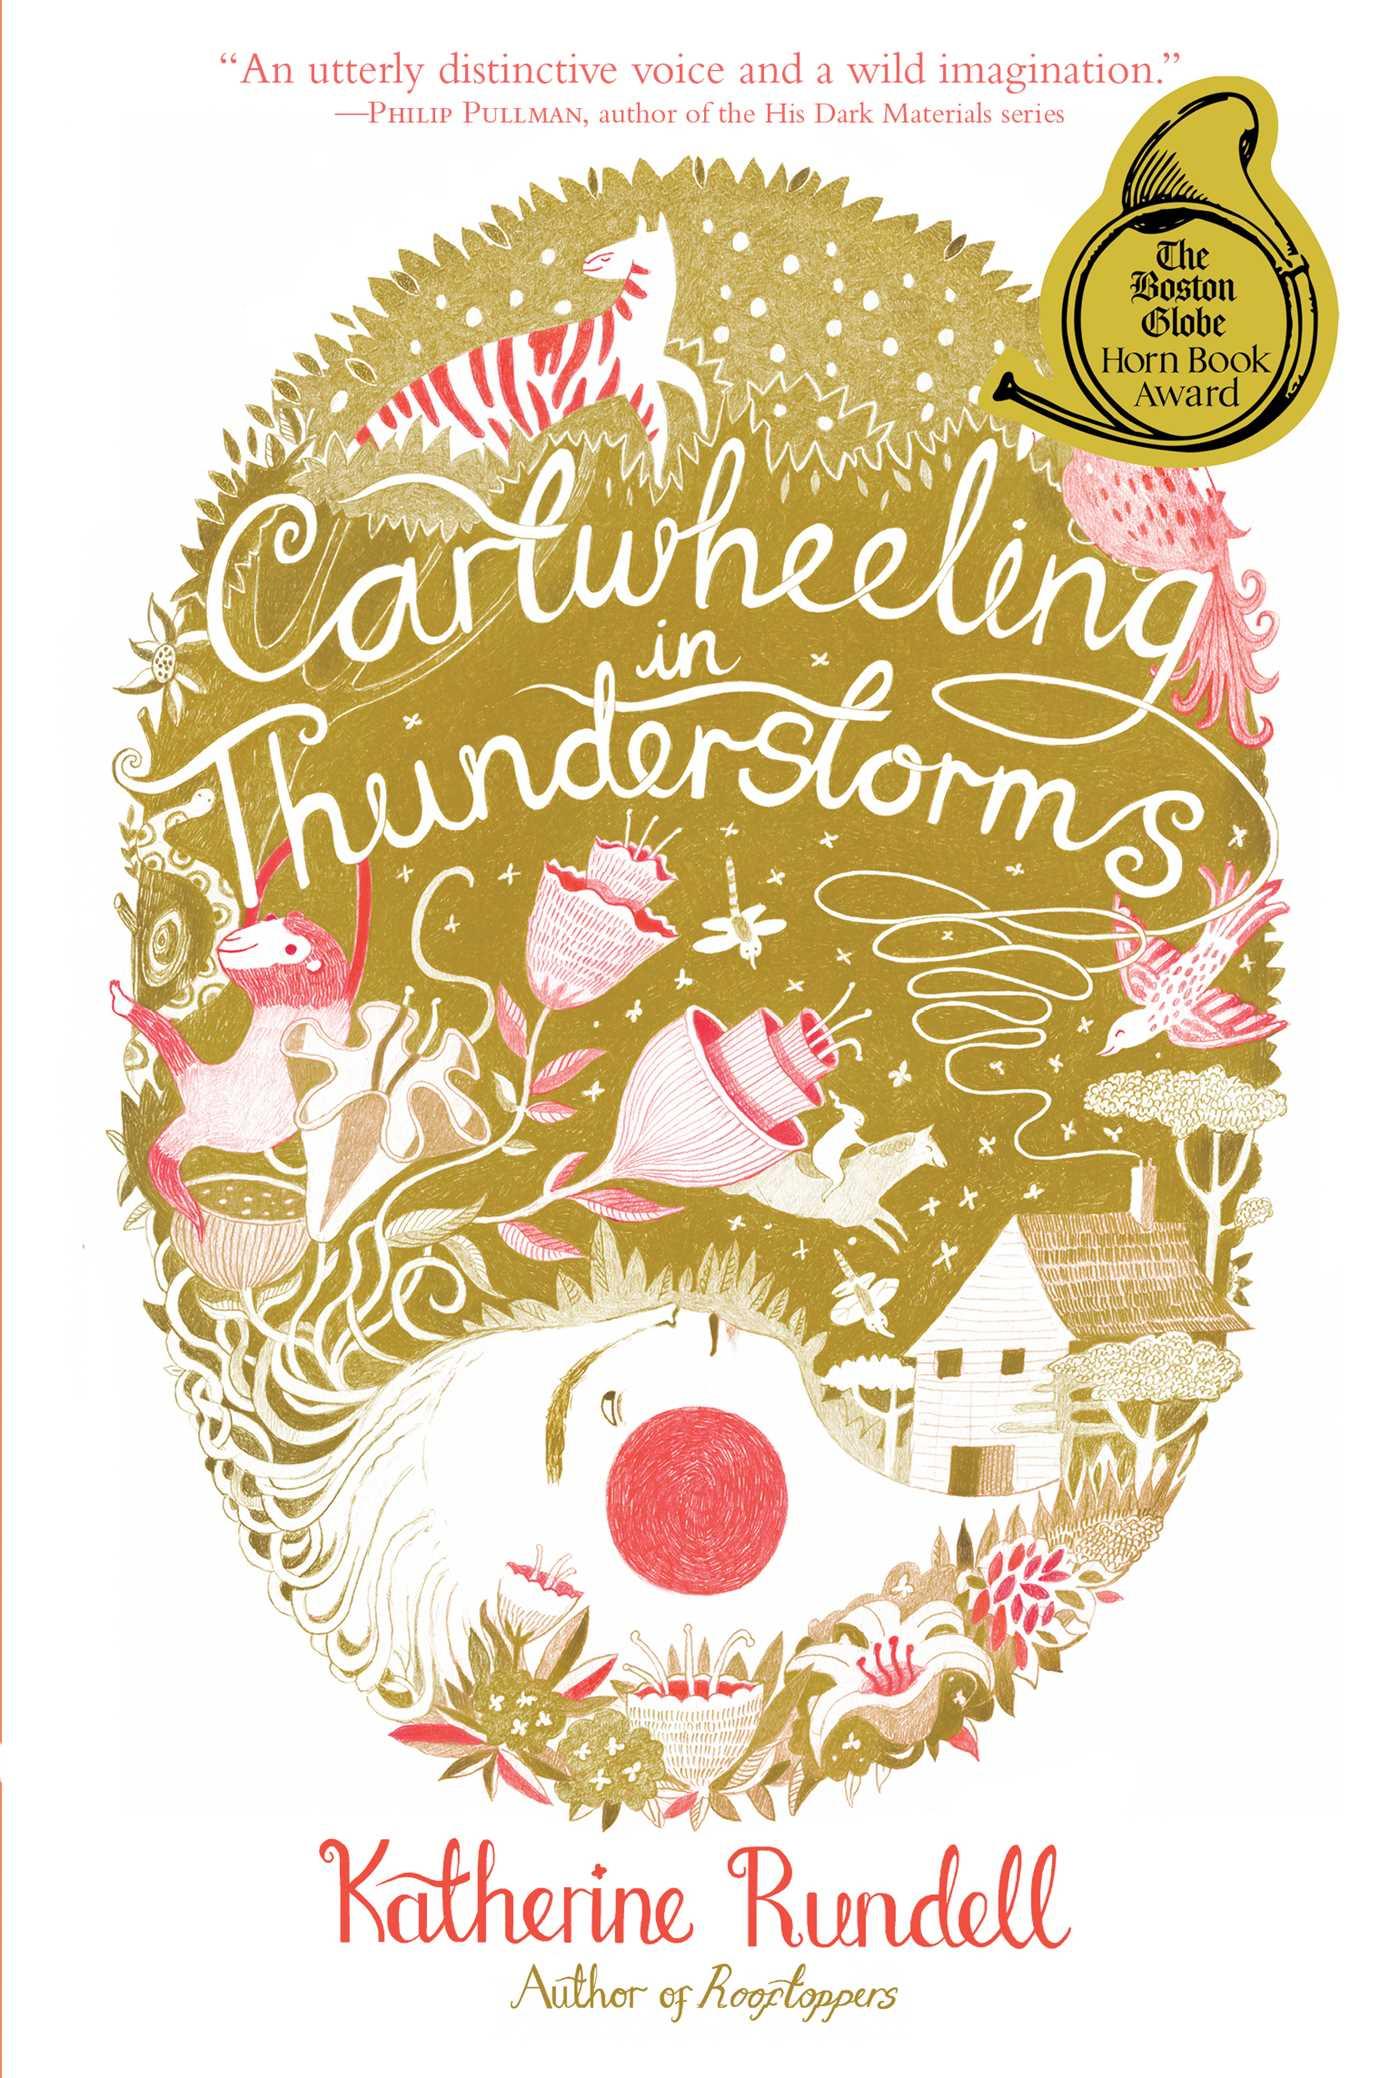 Cartwheeling in thunderstorms 9781442490628 hr